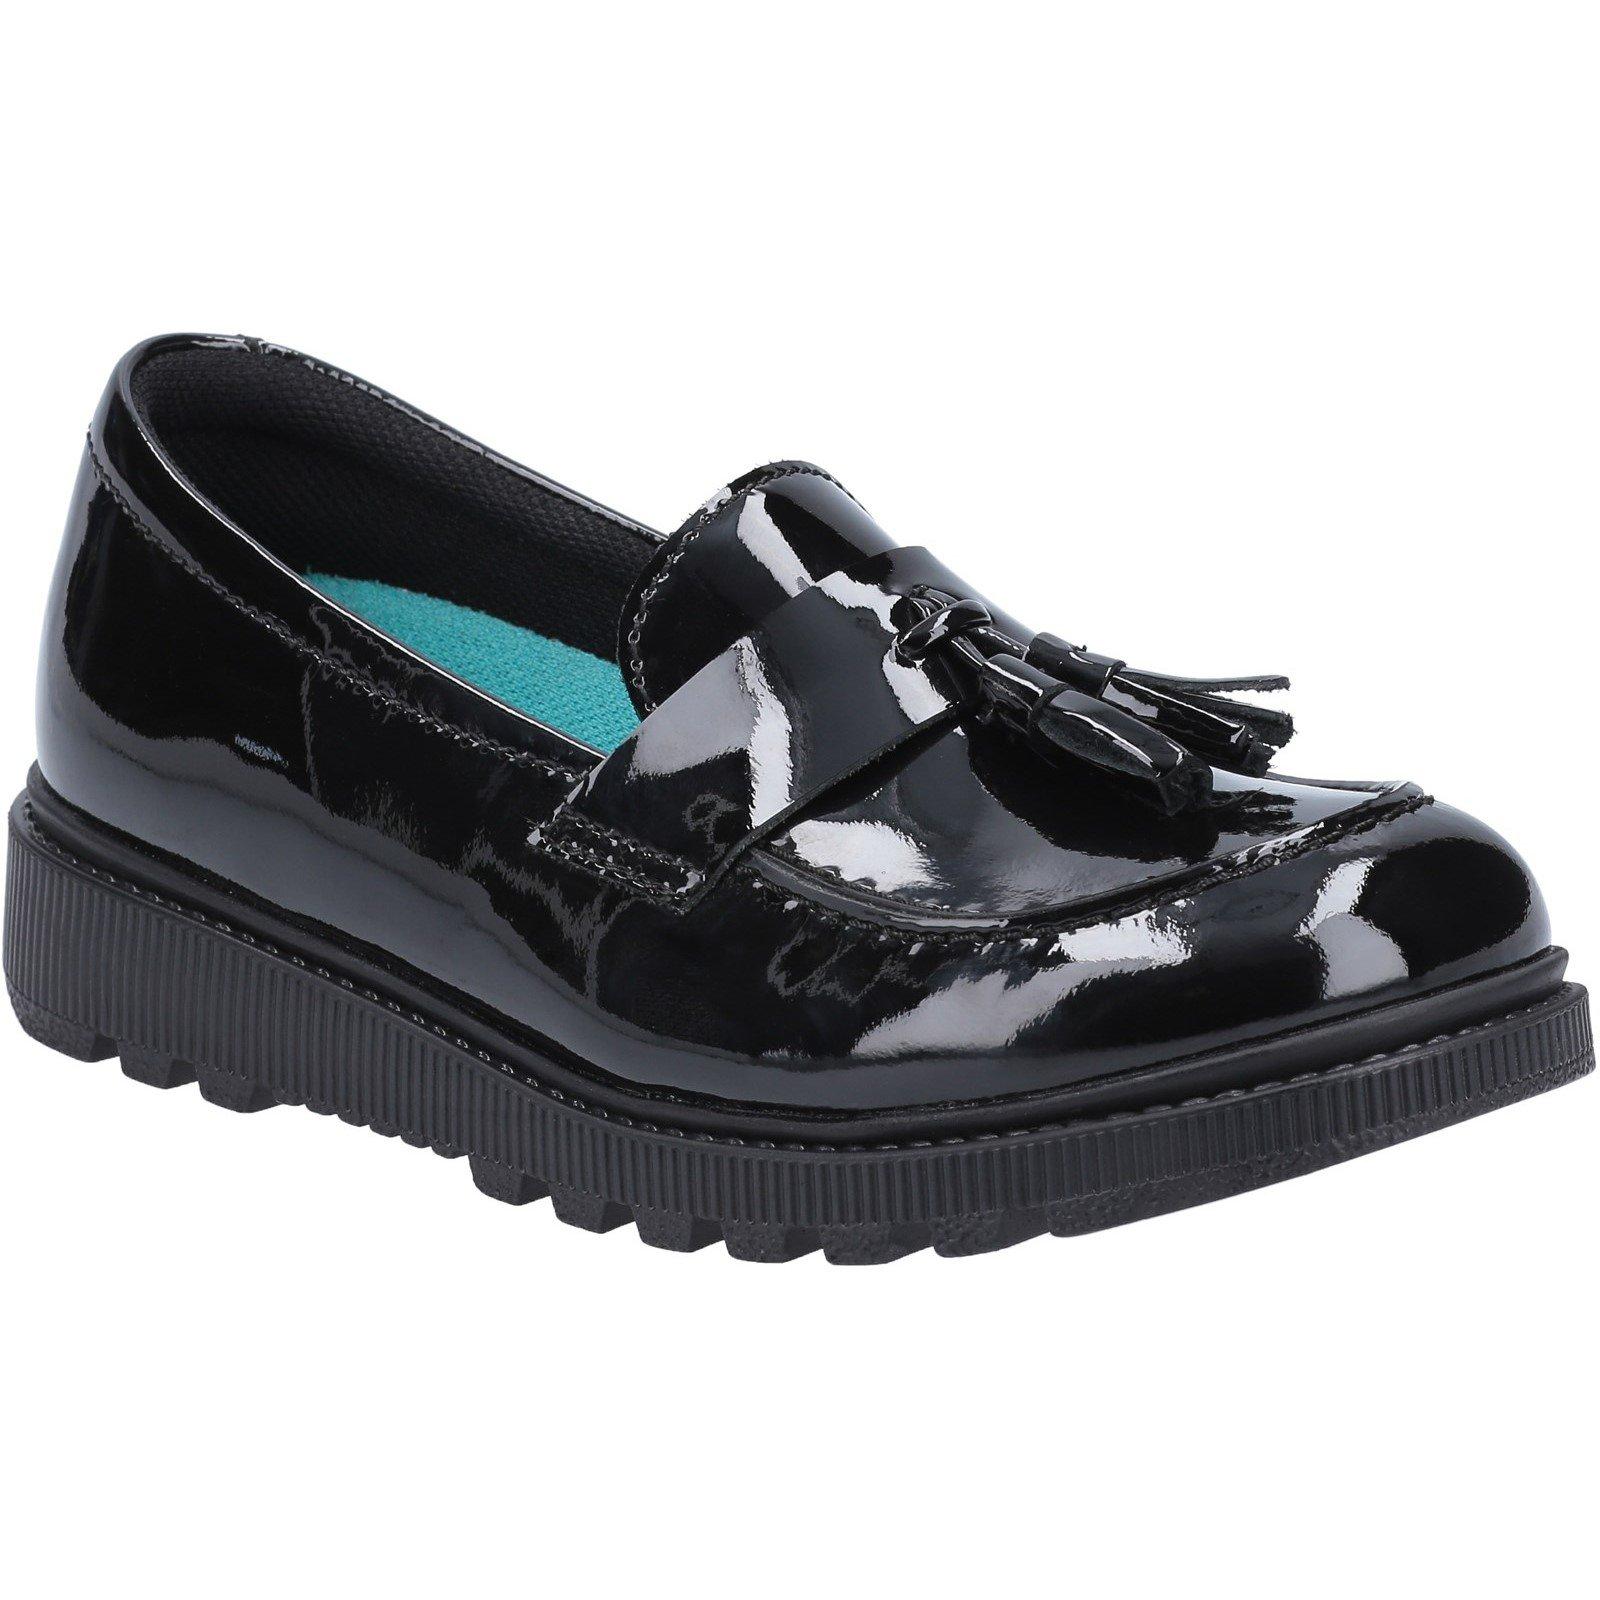 Hush Puppies Kid's Karen Senior School Shoe Patent Black 30828 - Patent Black 6